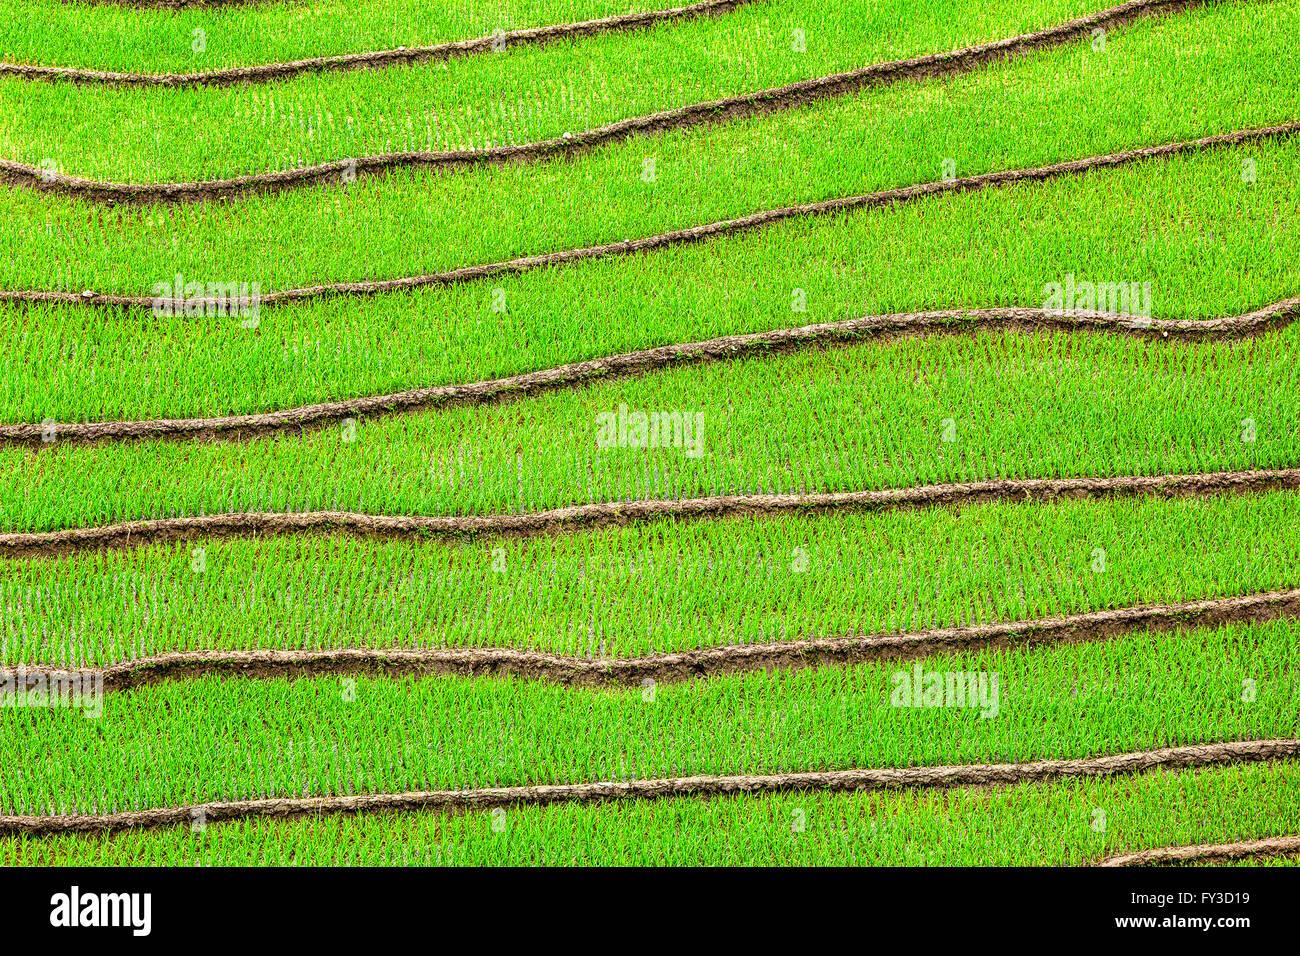 Rice field terraces - Stock Image